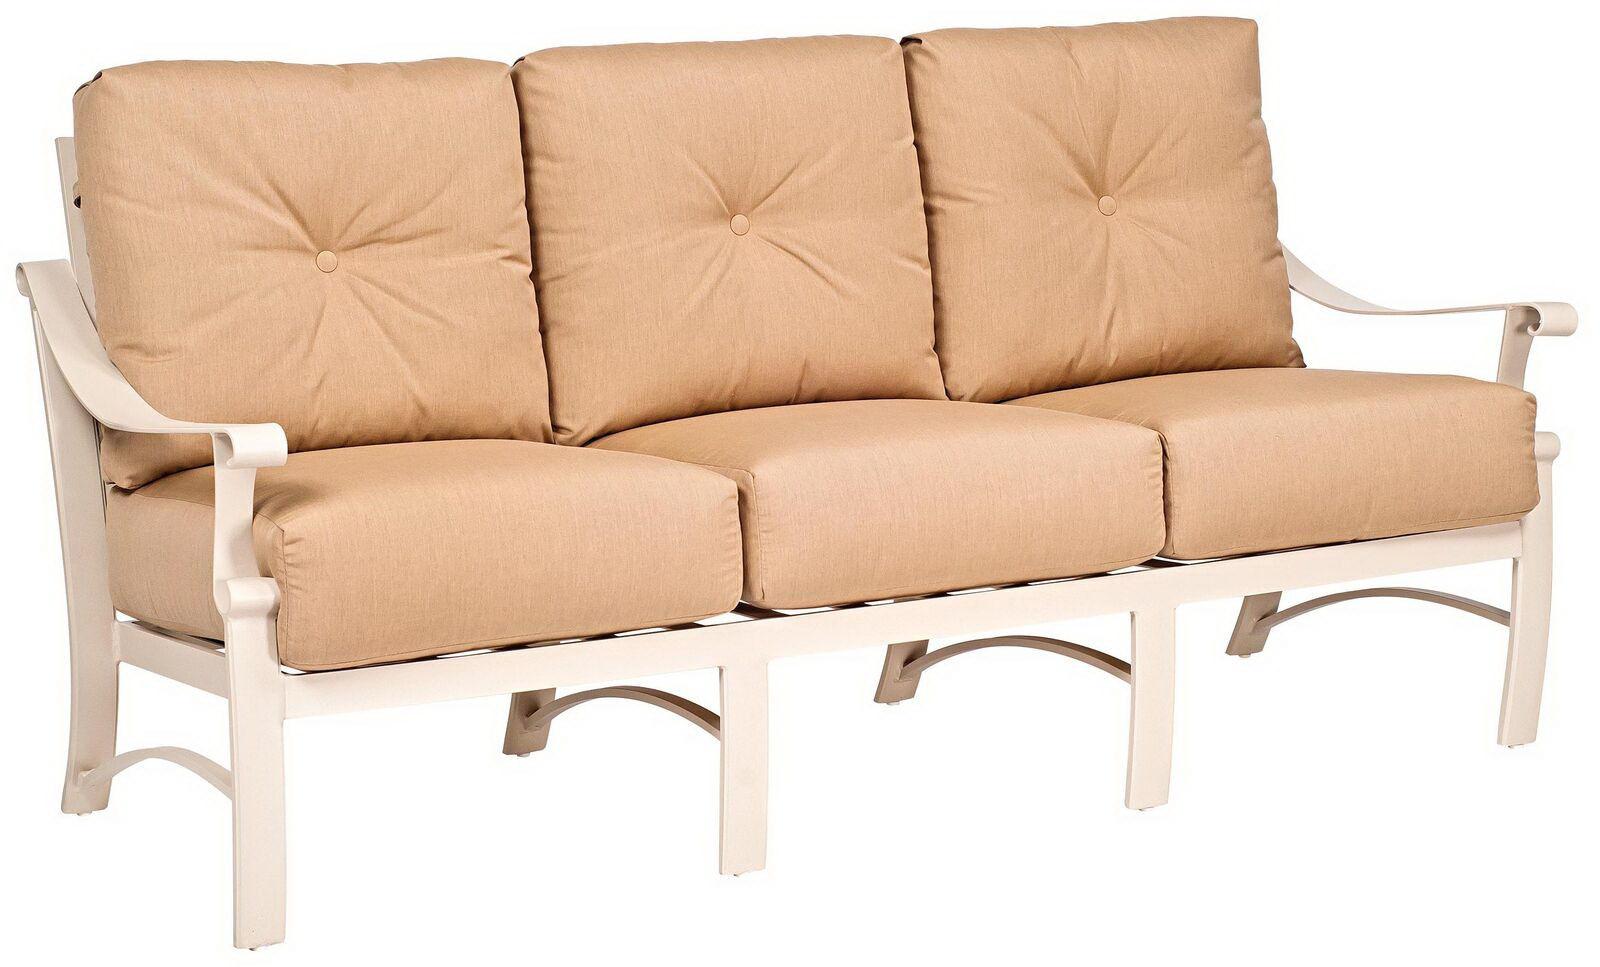 Outdoor/Patio Sofa By Woodard 8Q0420   Patios USA   USA Questions? Call  888.643.6003